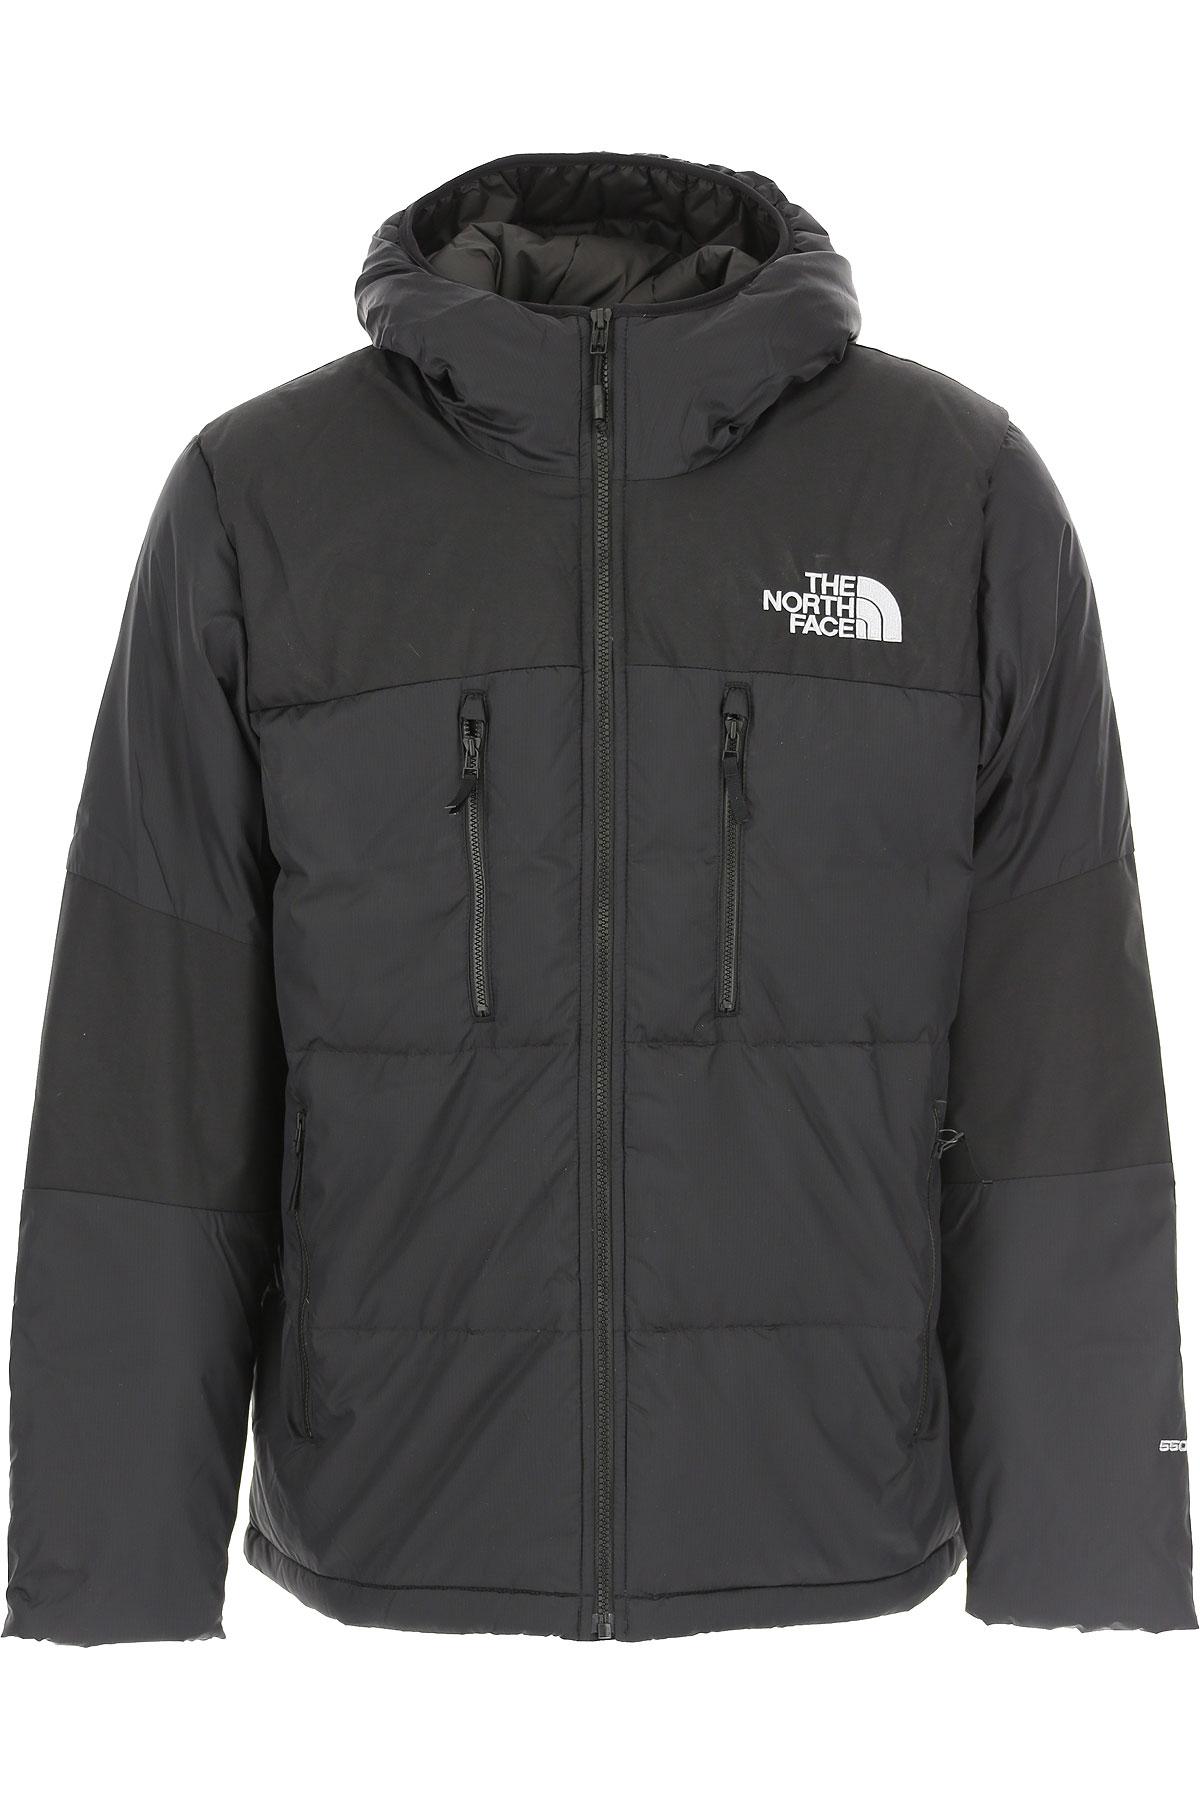 The North Face Down Jacket for Men, Puffer Ski Jacket On Sale, Black, polyamide, 2019, L M